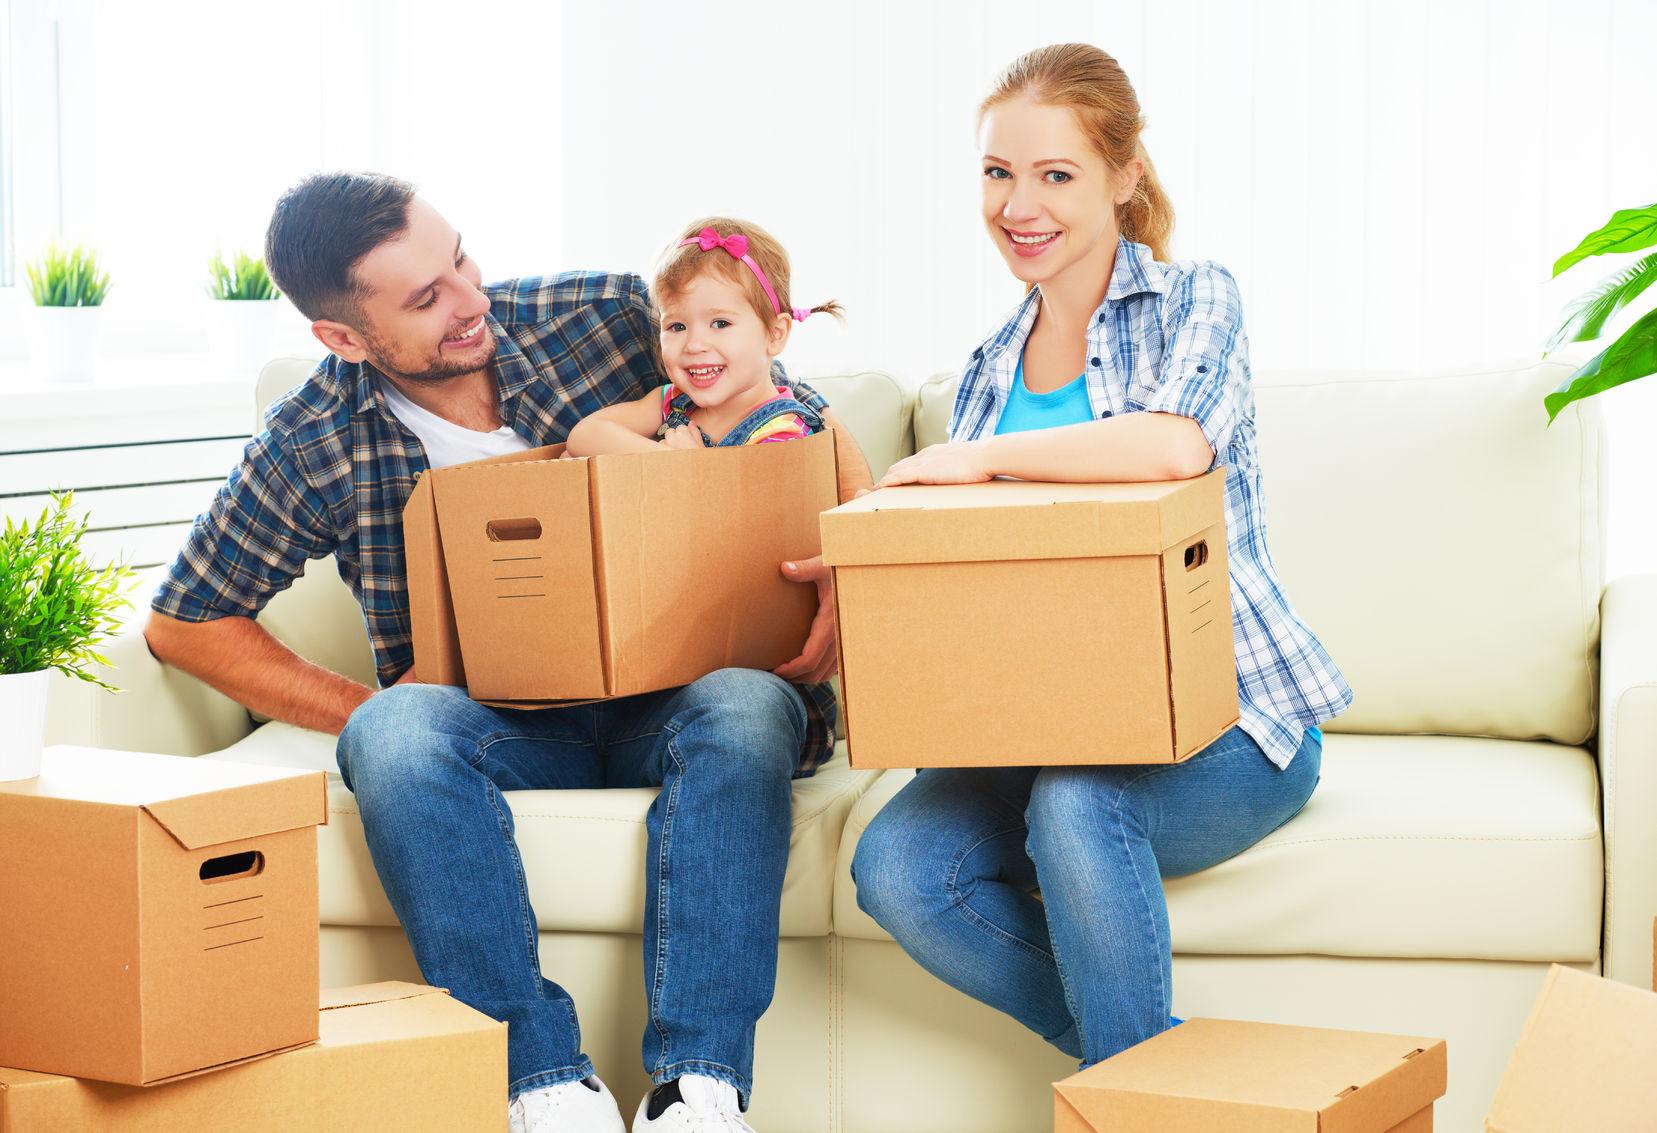 Дети и коробки фото